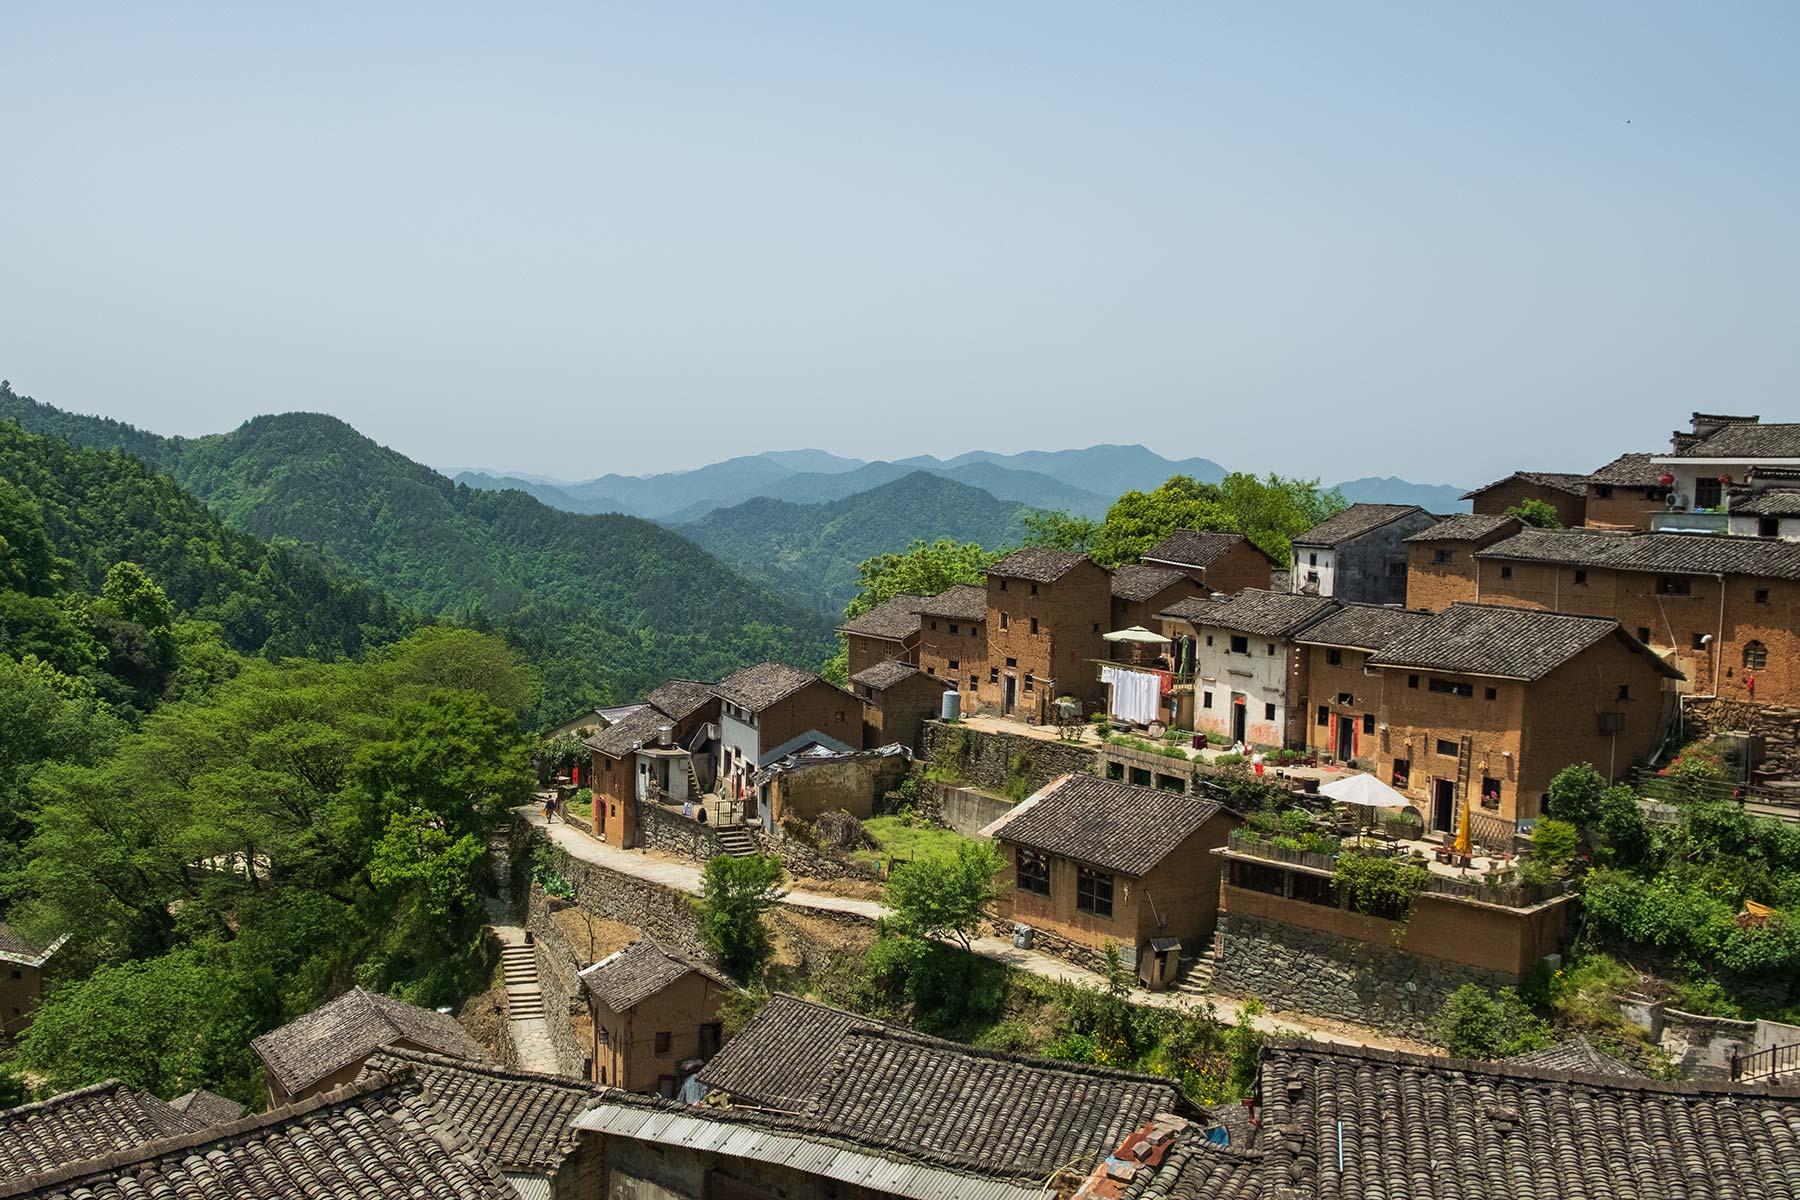 Blick auf Yangchan Tulou 阳产土楼 Erdhäuser Dorf in Anhui, China